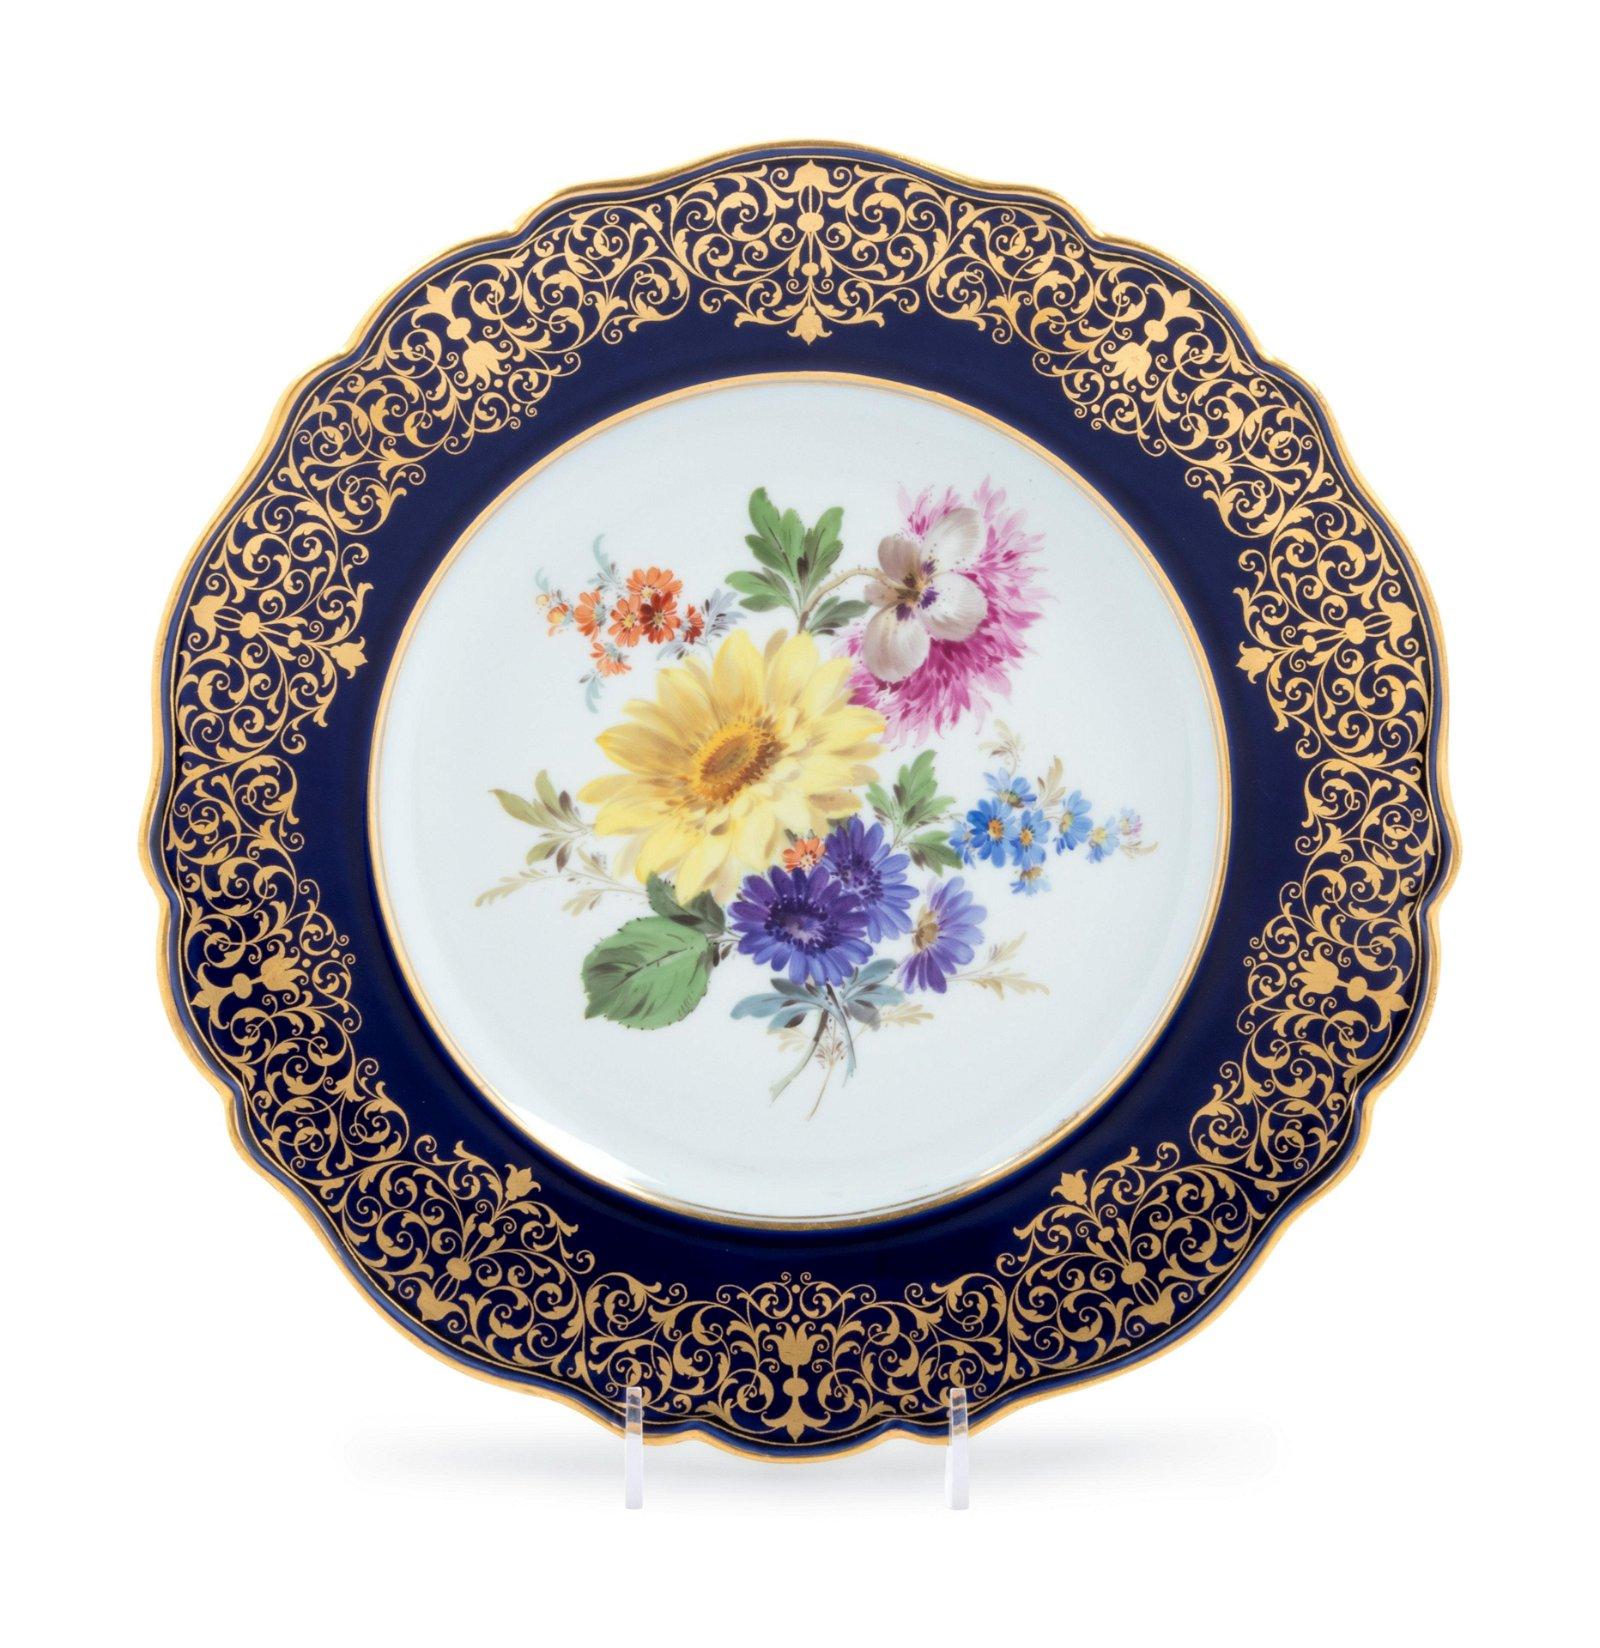 A Meissen Painted and Parcel Gilt Porcelain Plate